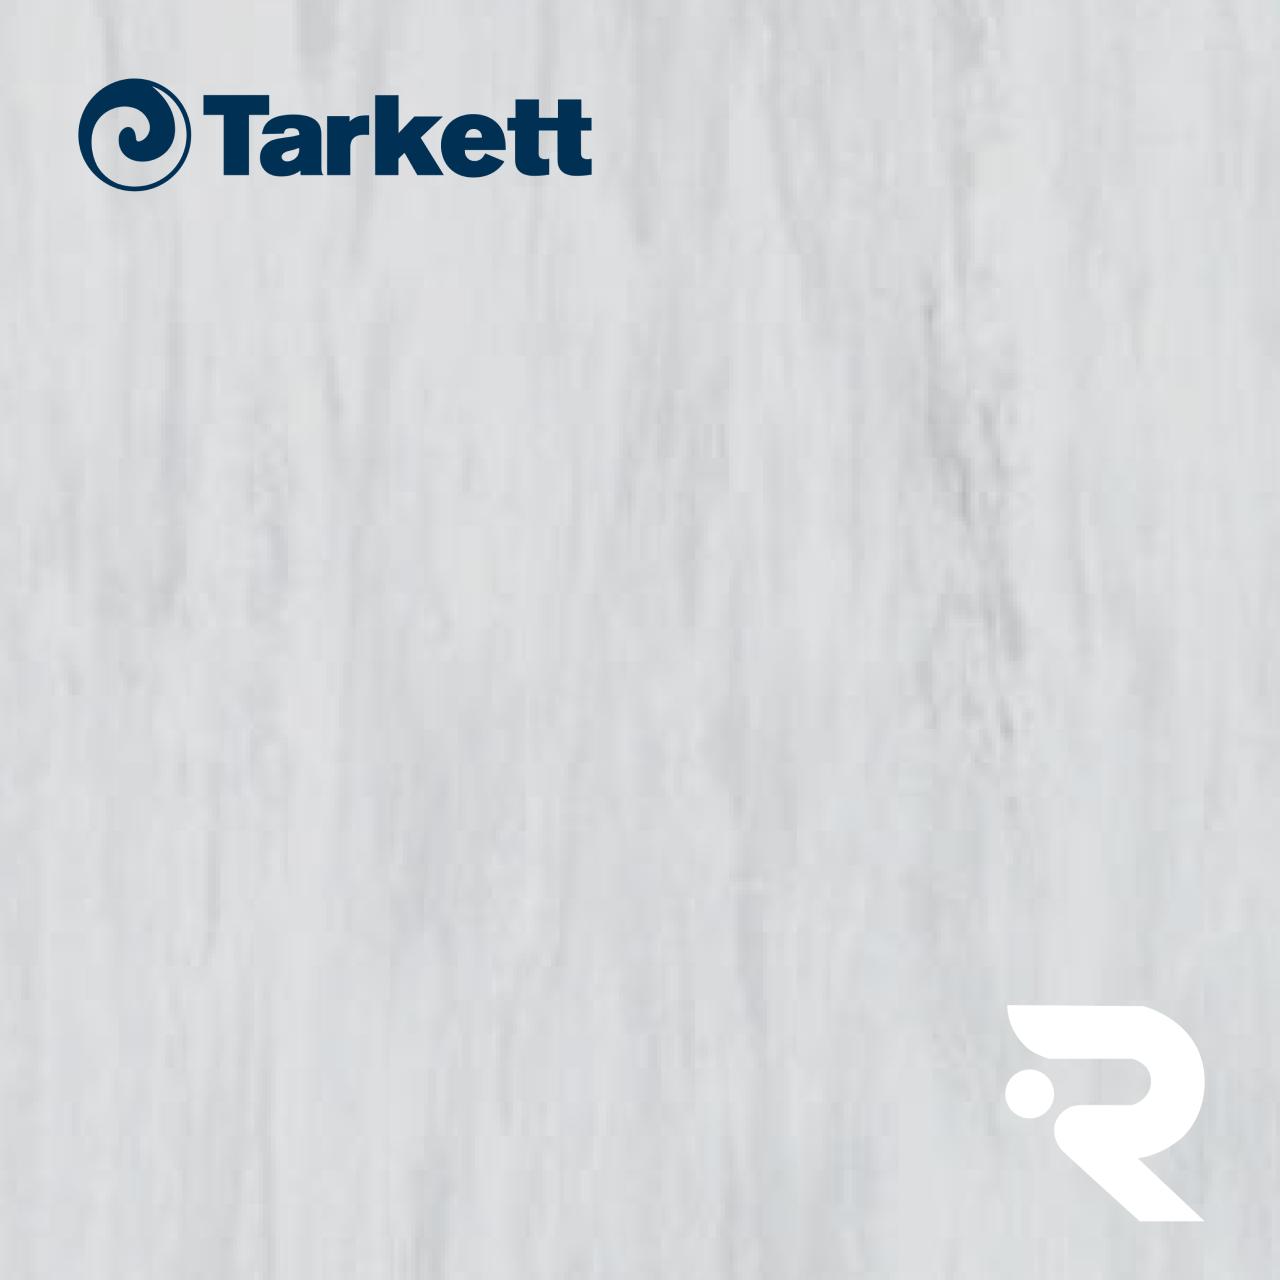 🏫 Гомогенный линолеум Tarkett   Standard LIGHT BLUE 0919   Standard Plus 2.0 mm   2 х 23 м